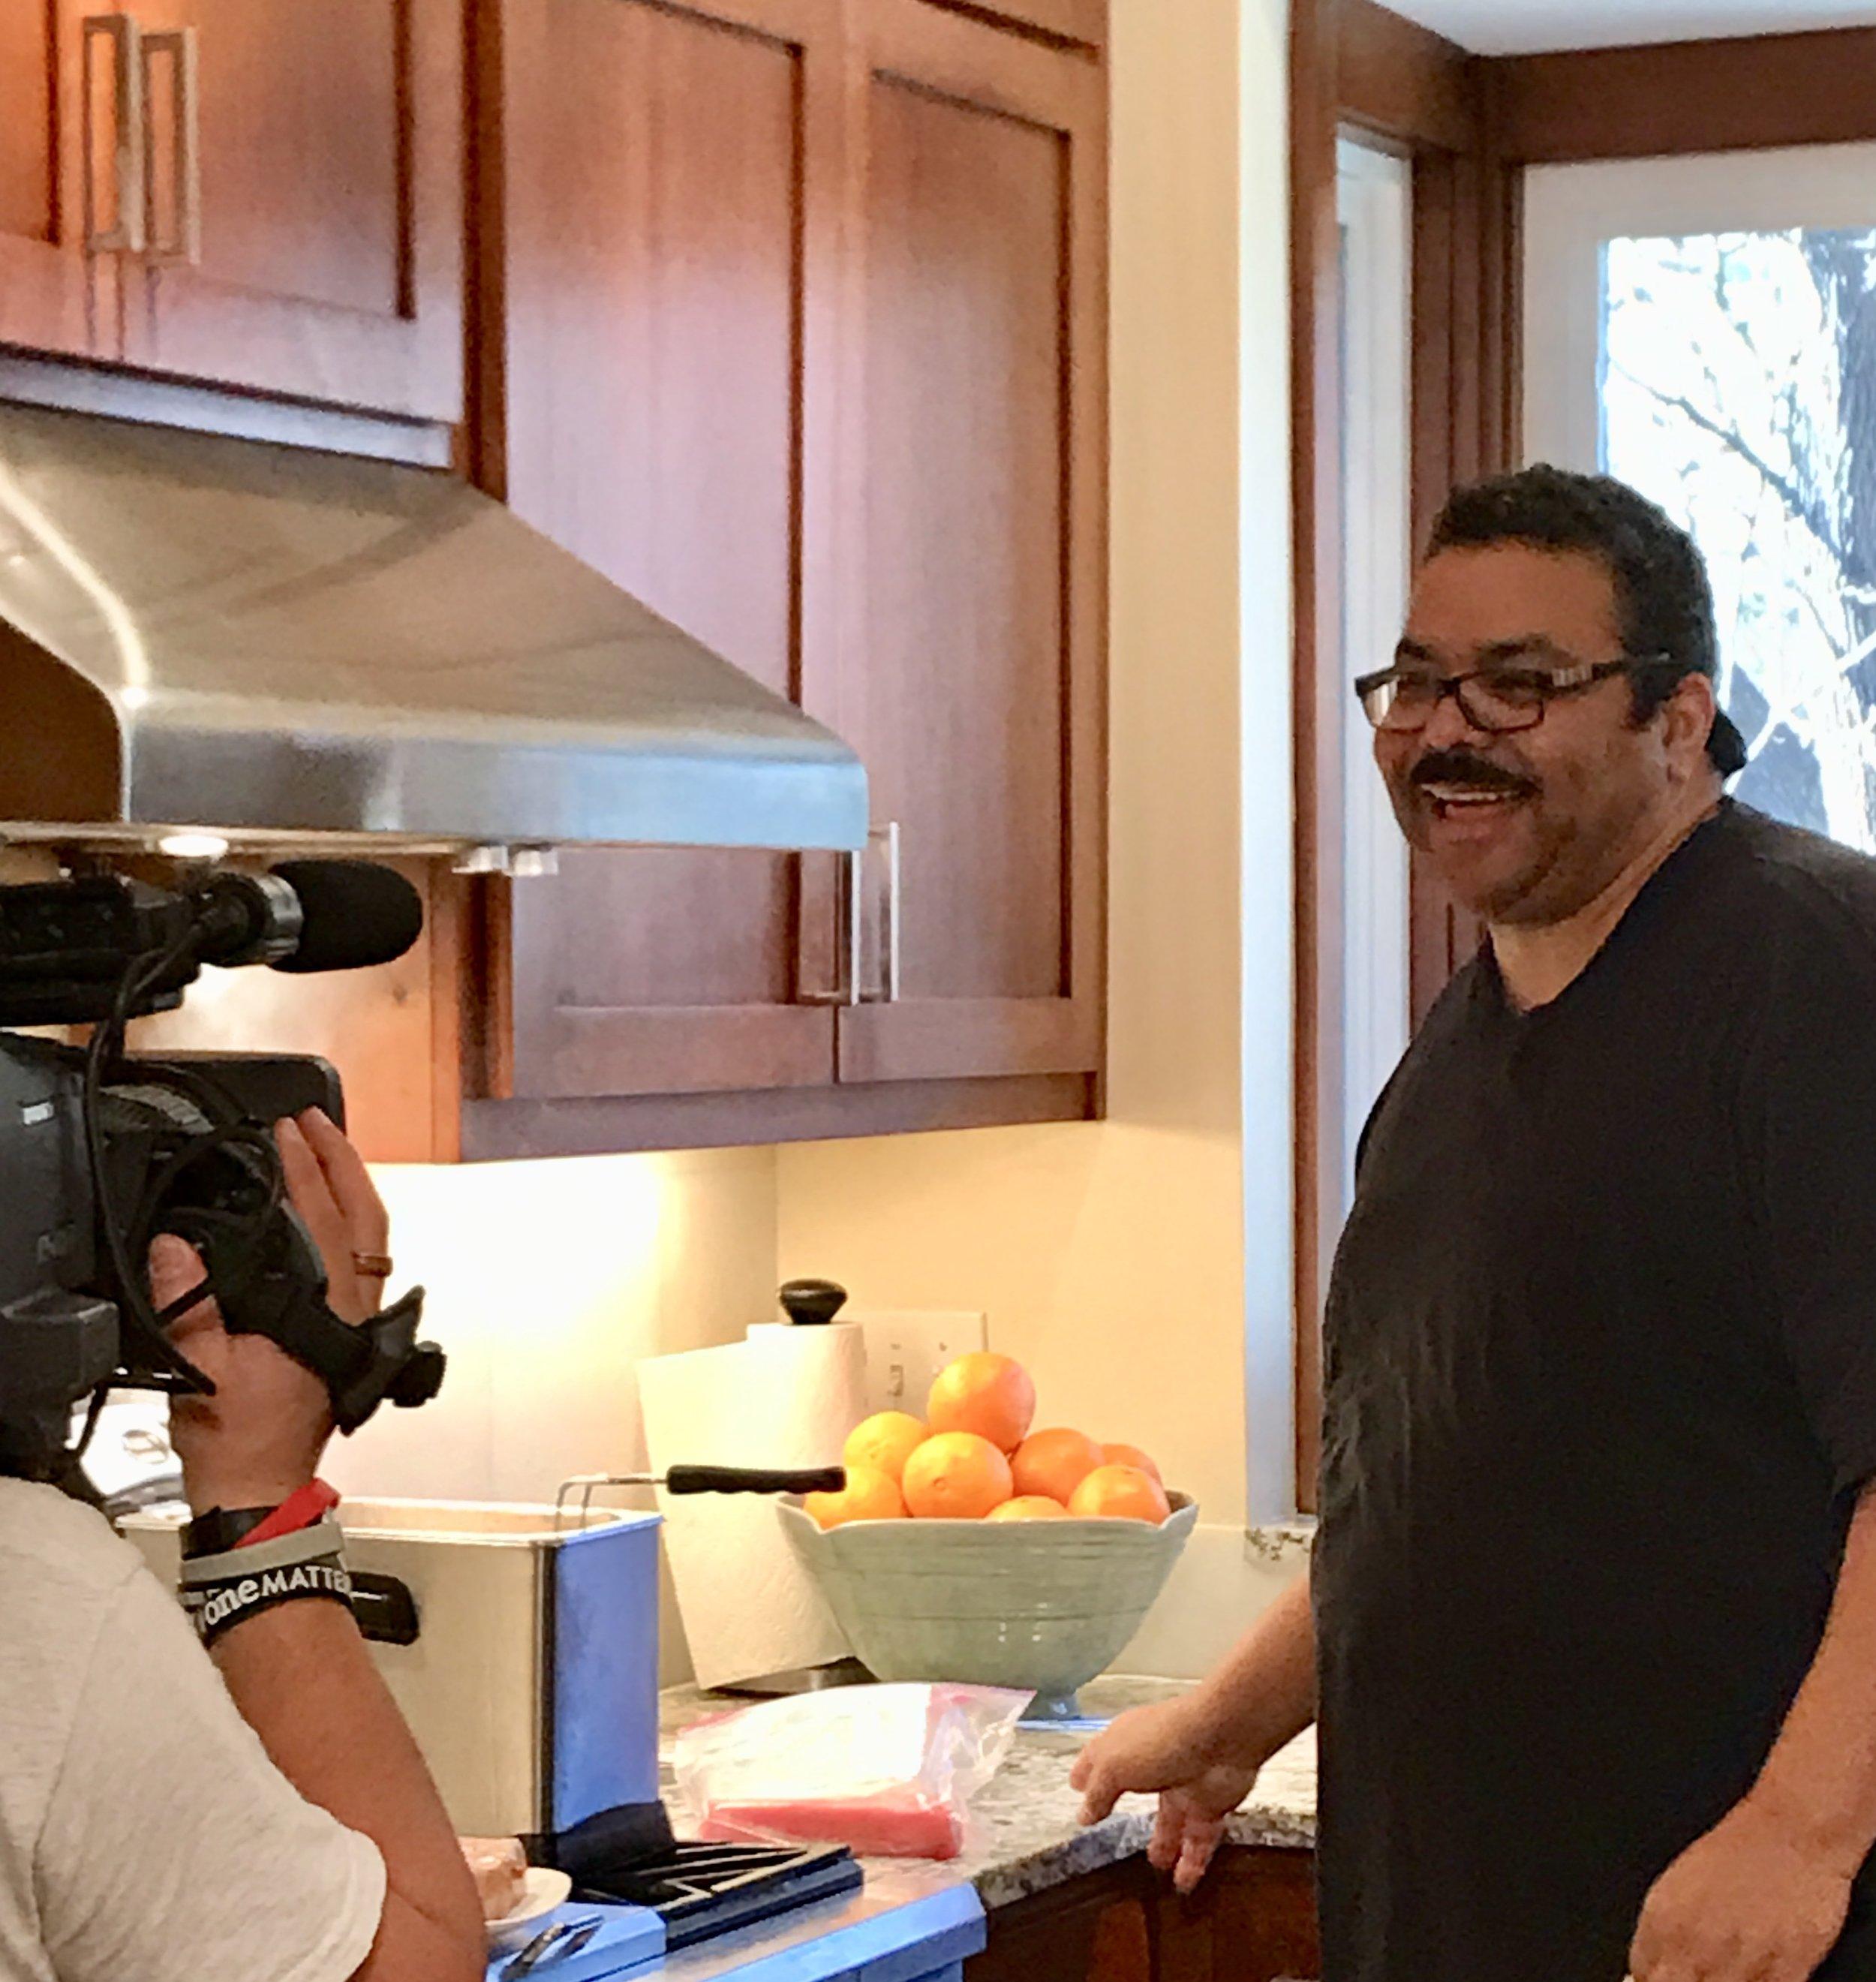 Chef Juan Having Fun on Camera